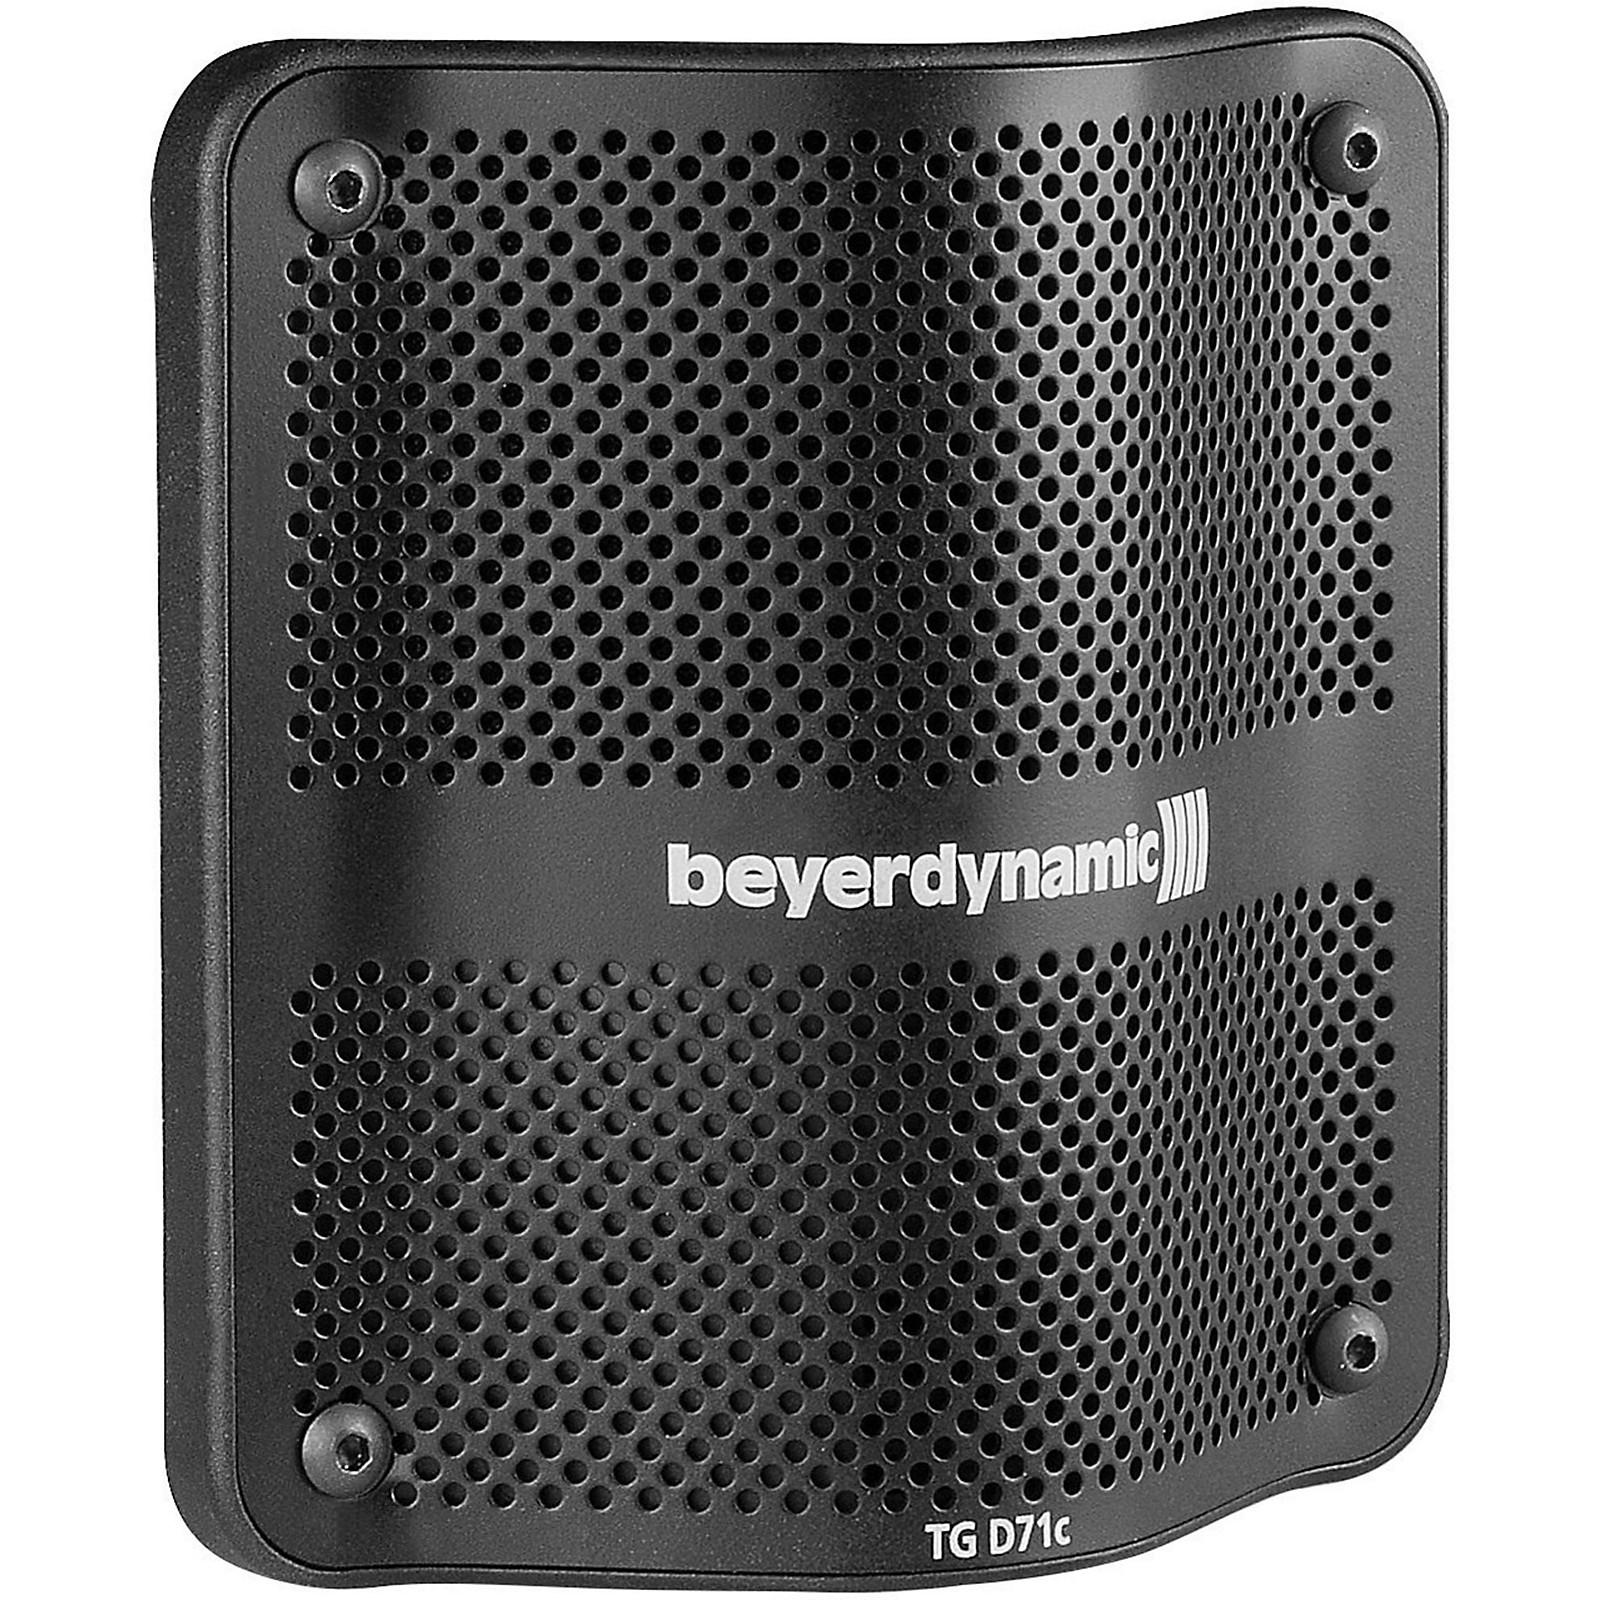 Beyerdynamic TG D71c Professional Kick Drum Microphone